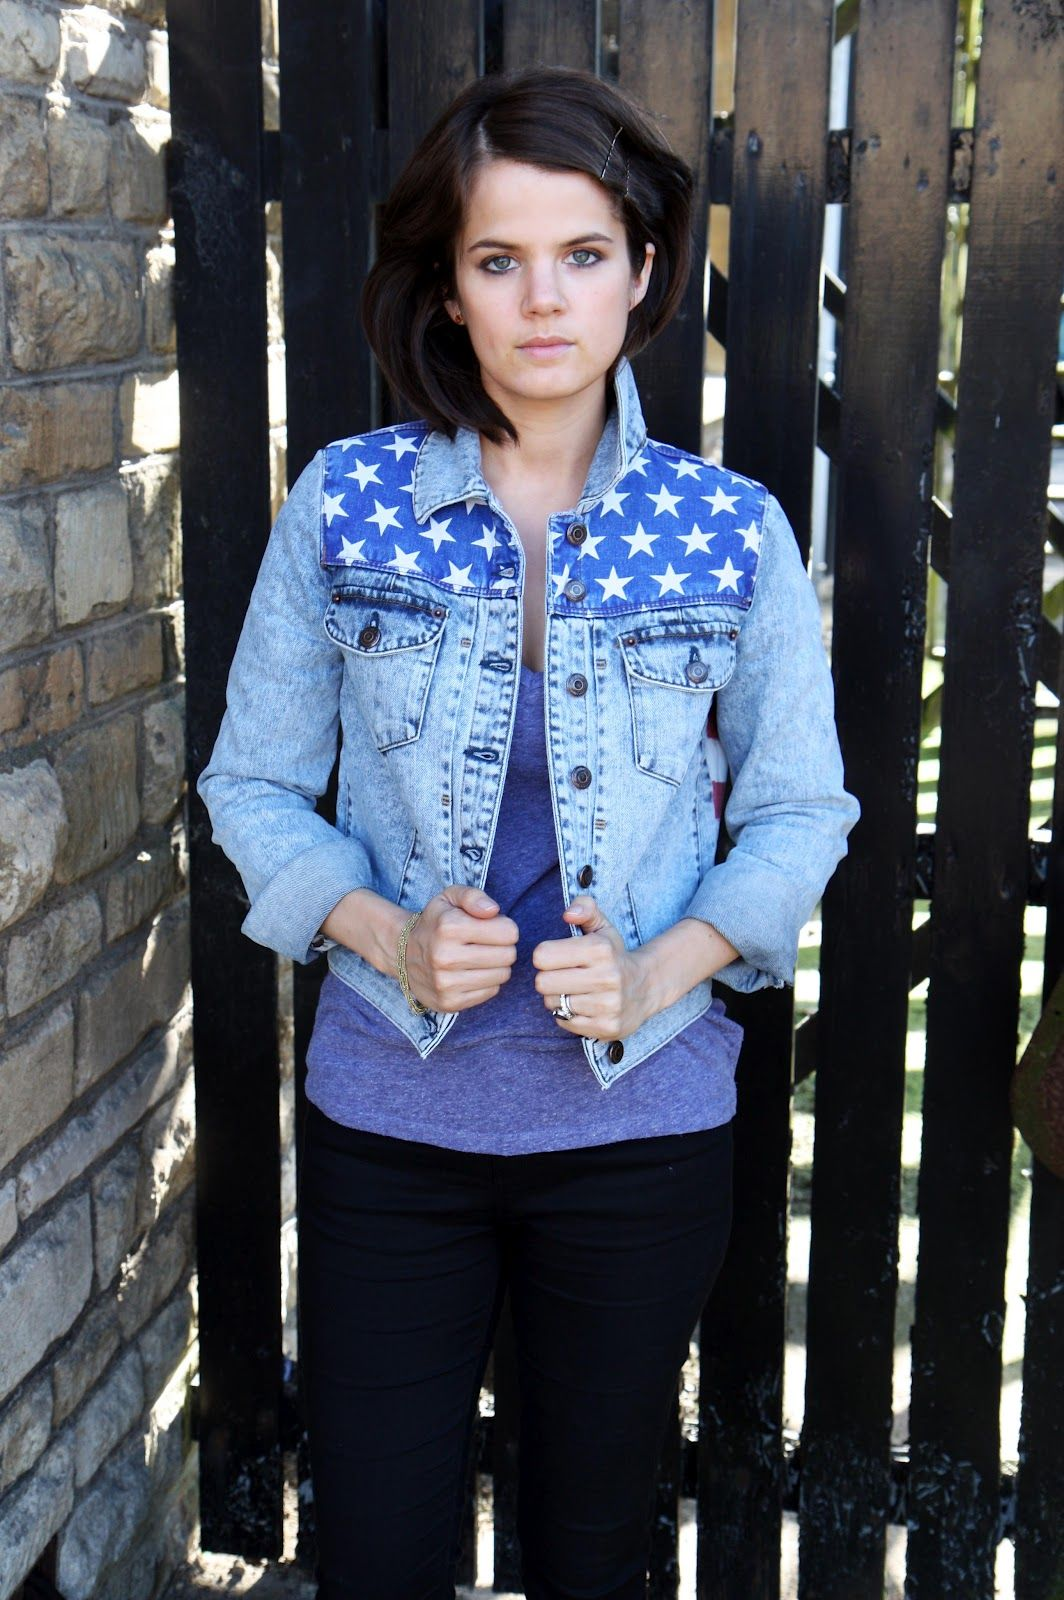 The jean jacket.